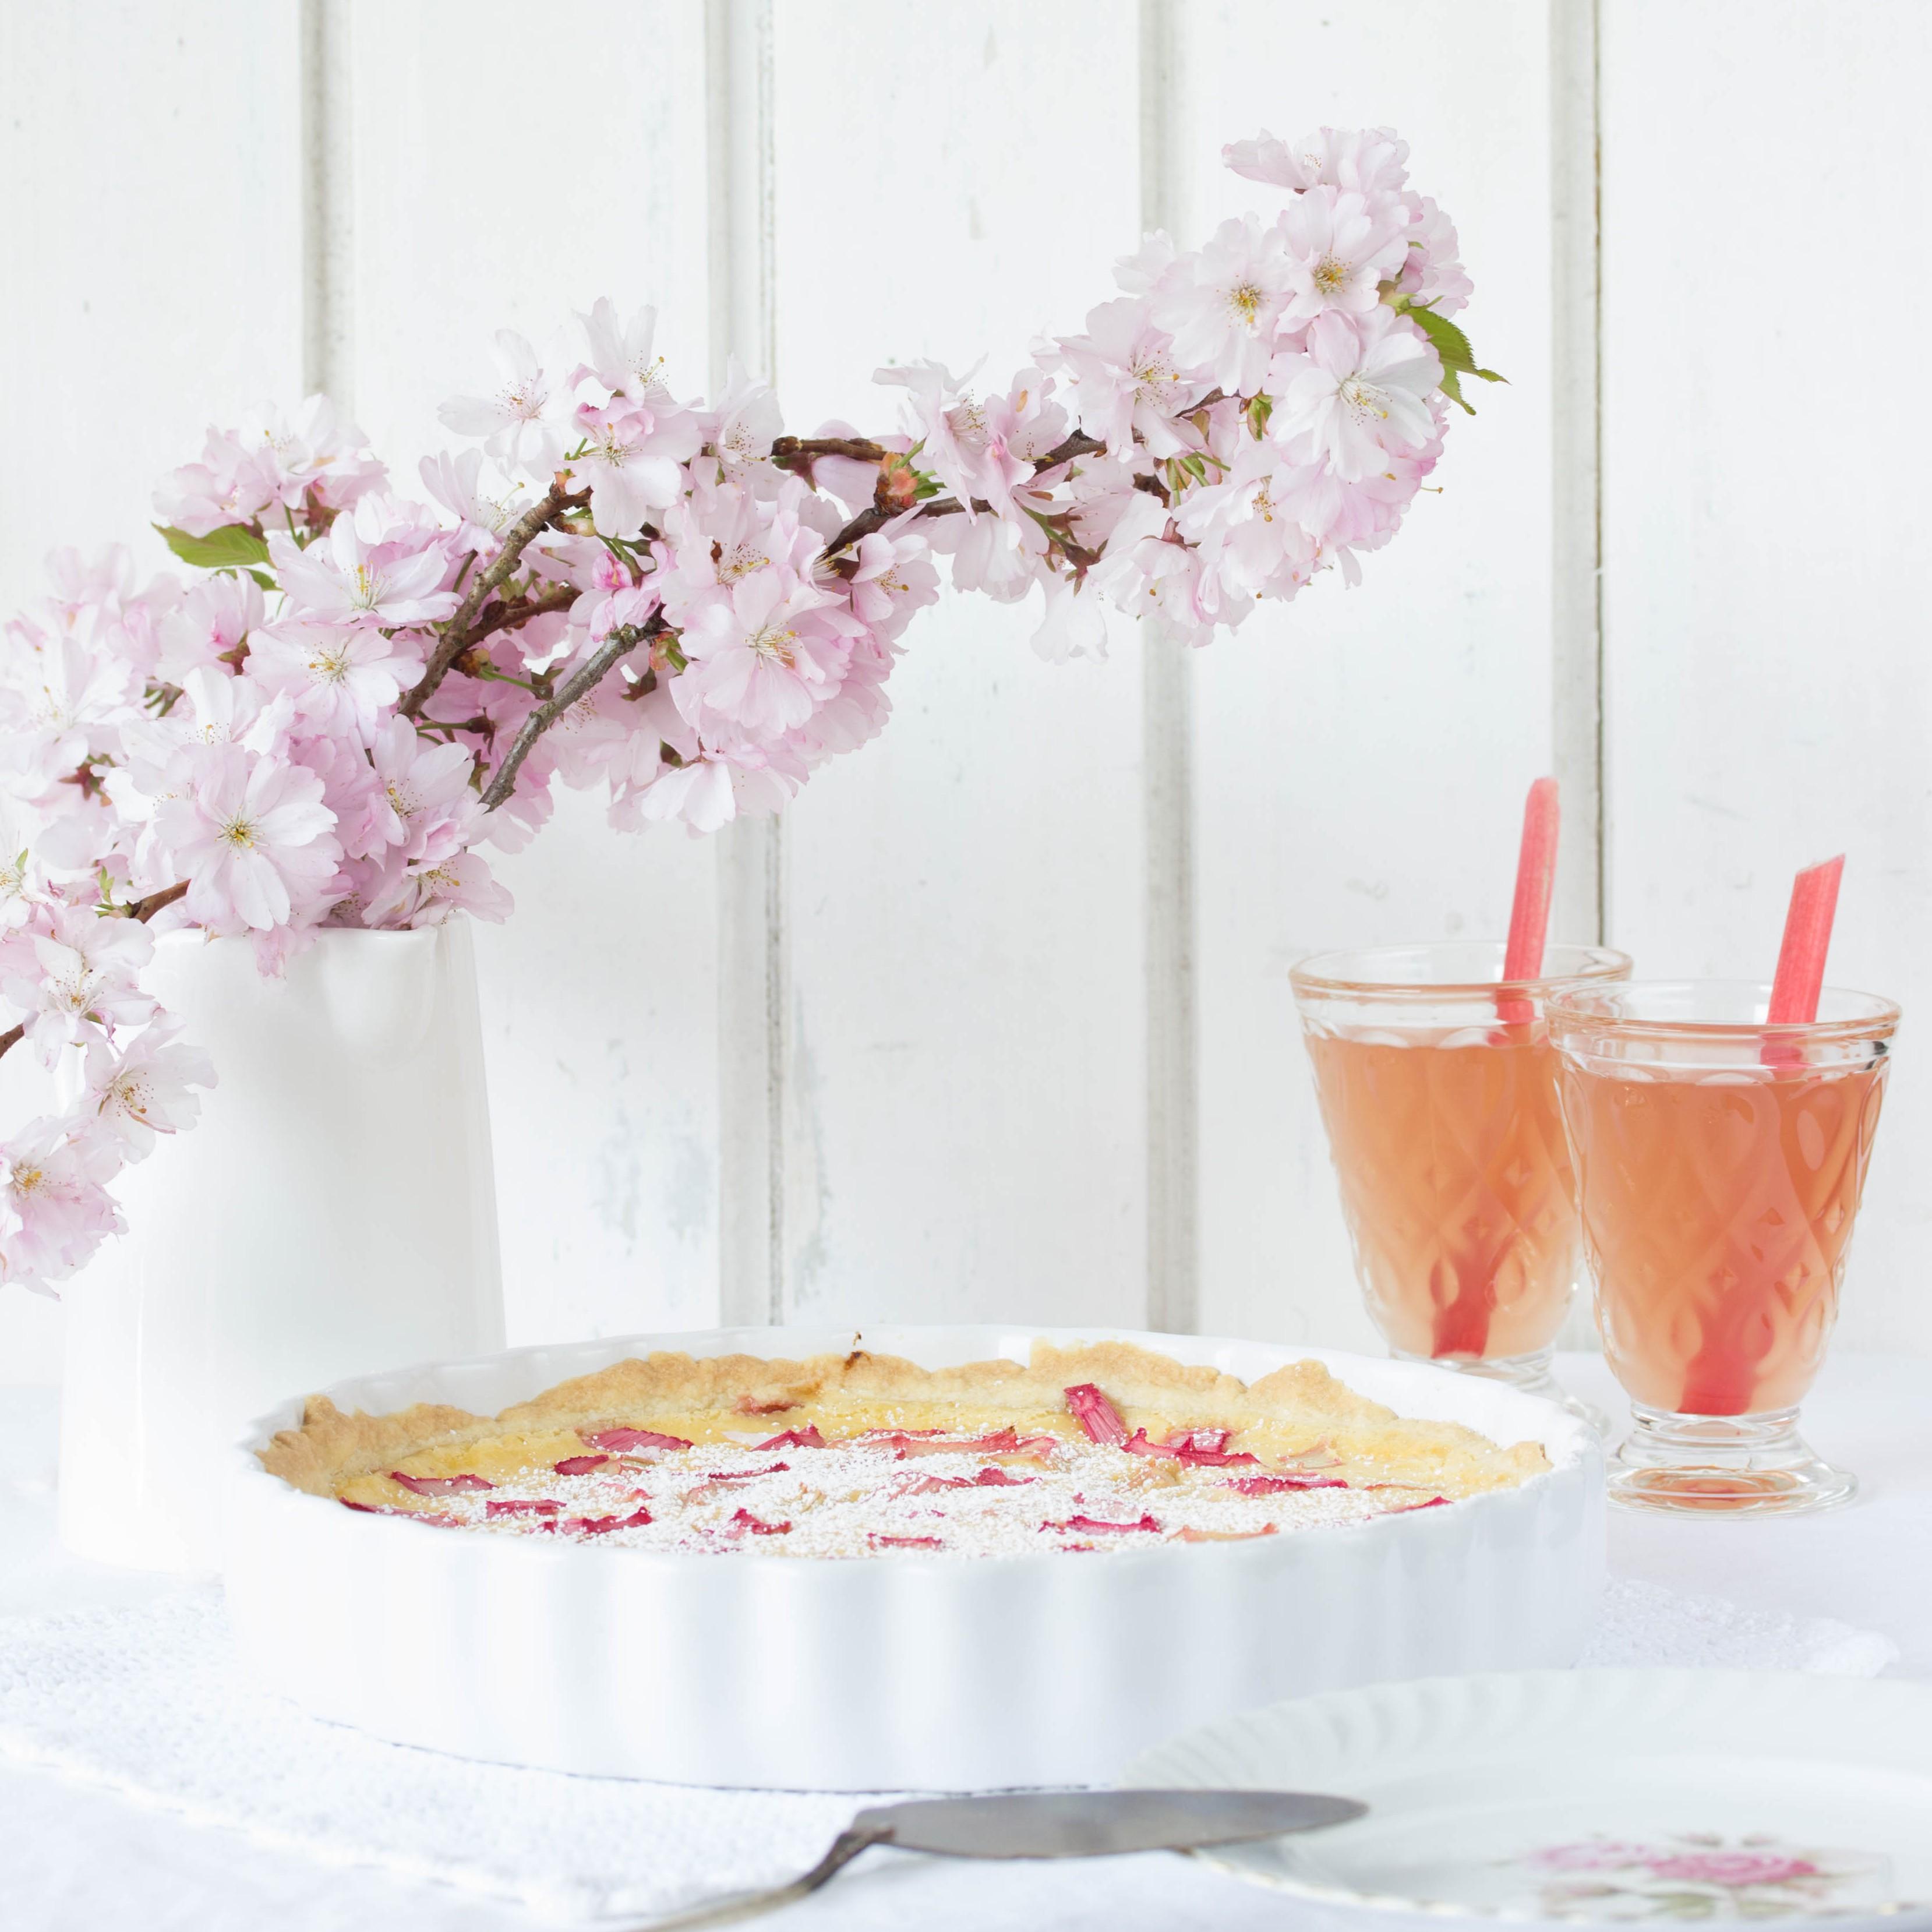 Einfaches Rhabarber Pudding Tarte Rezept backen Frühling #rhubarb #rhabarber #tarte | Emma´s Lieblingsstücke